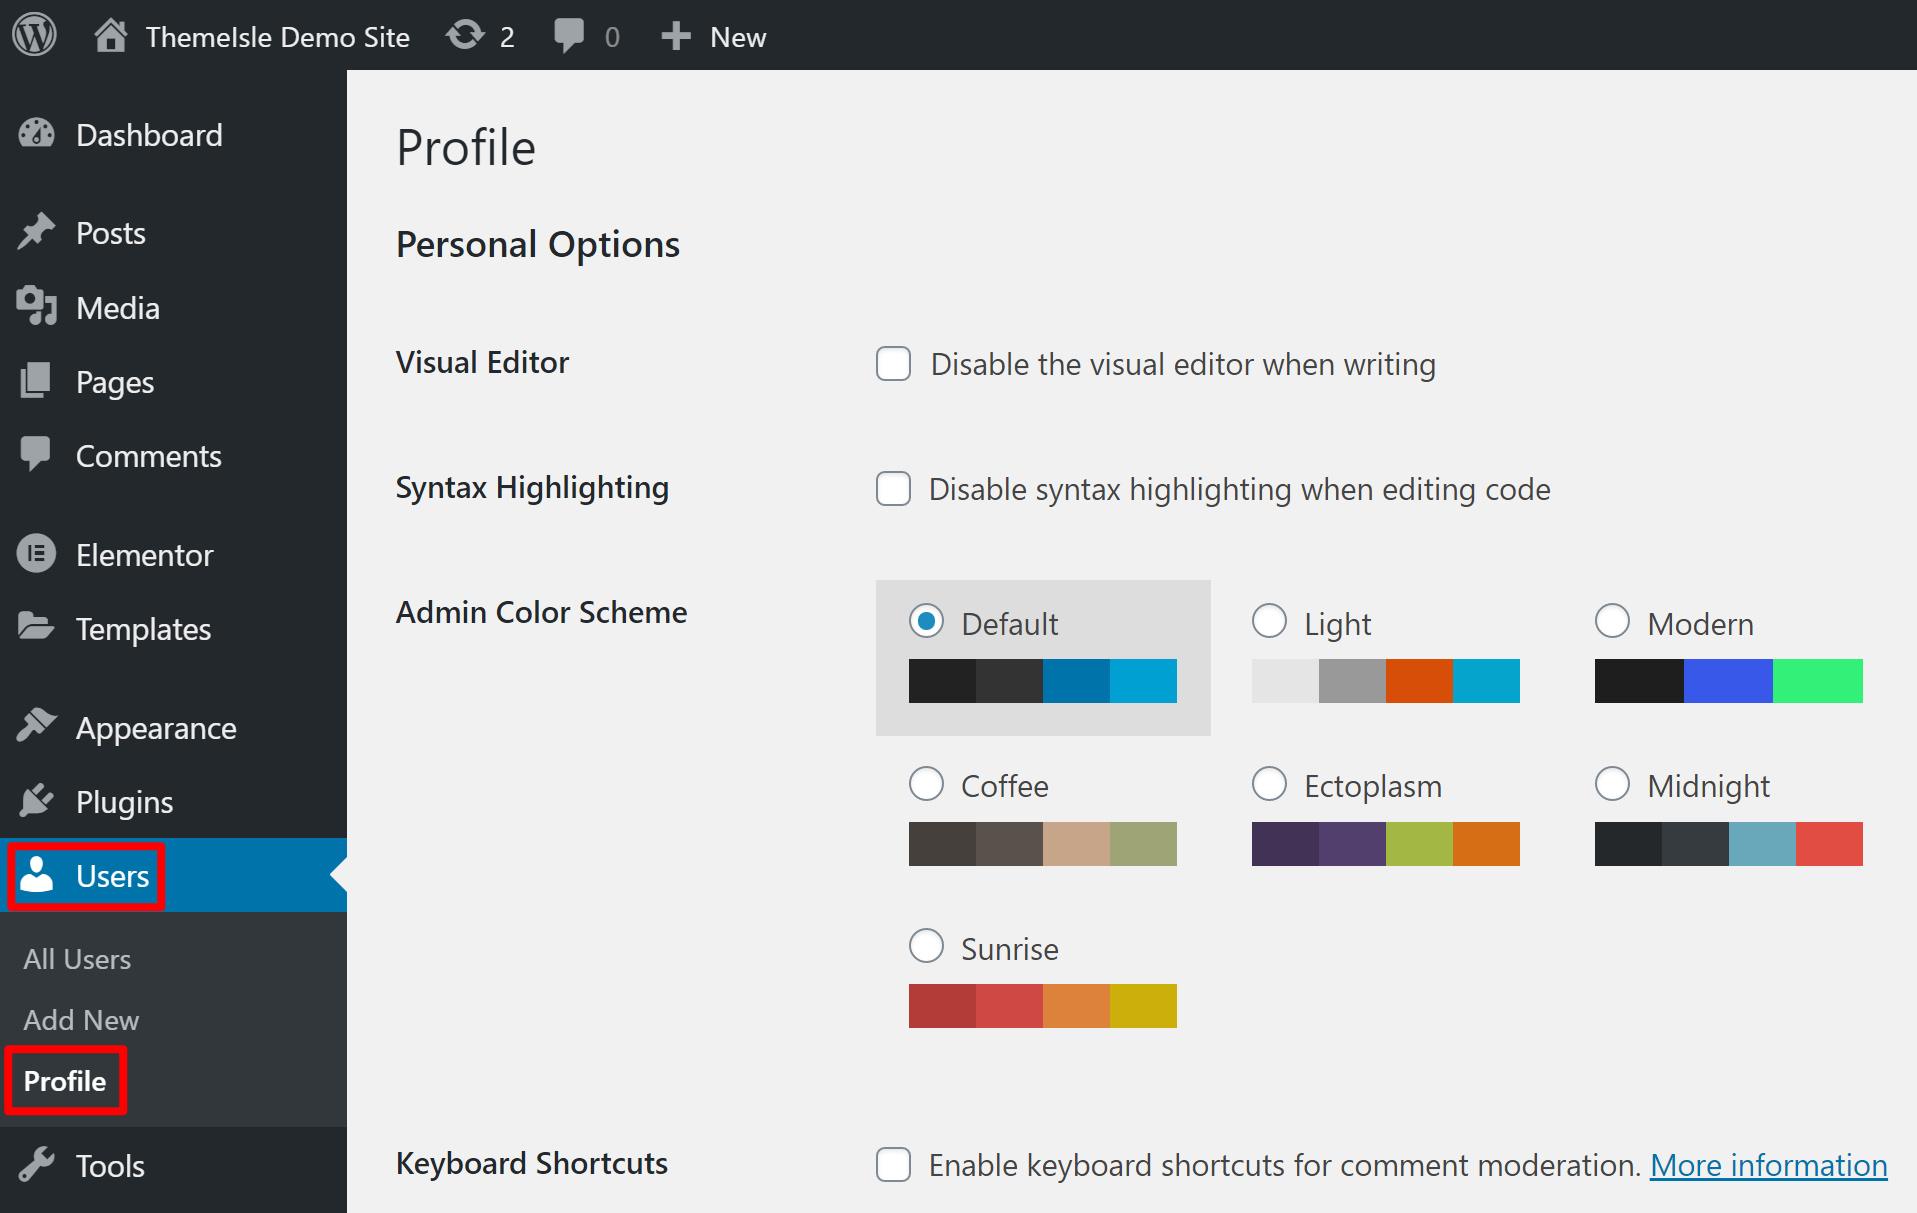 Open WordPress profile